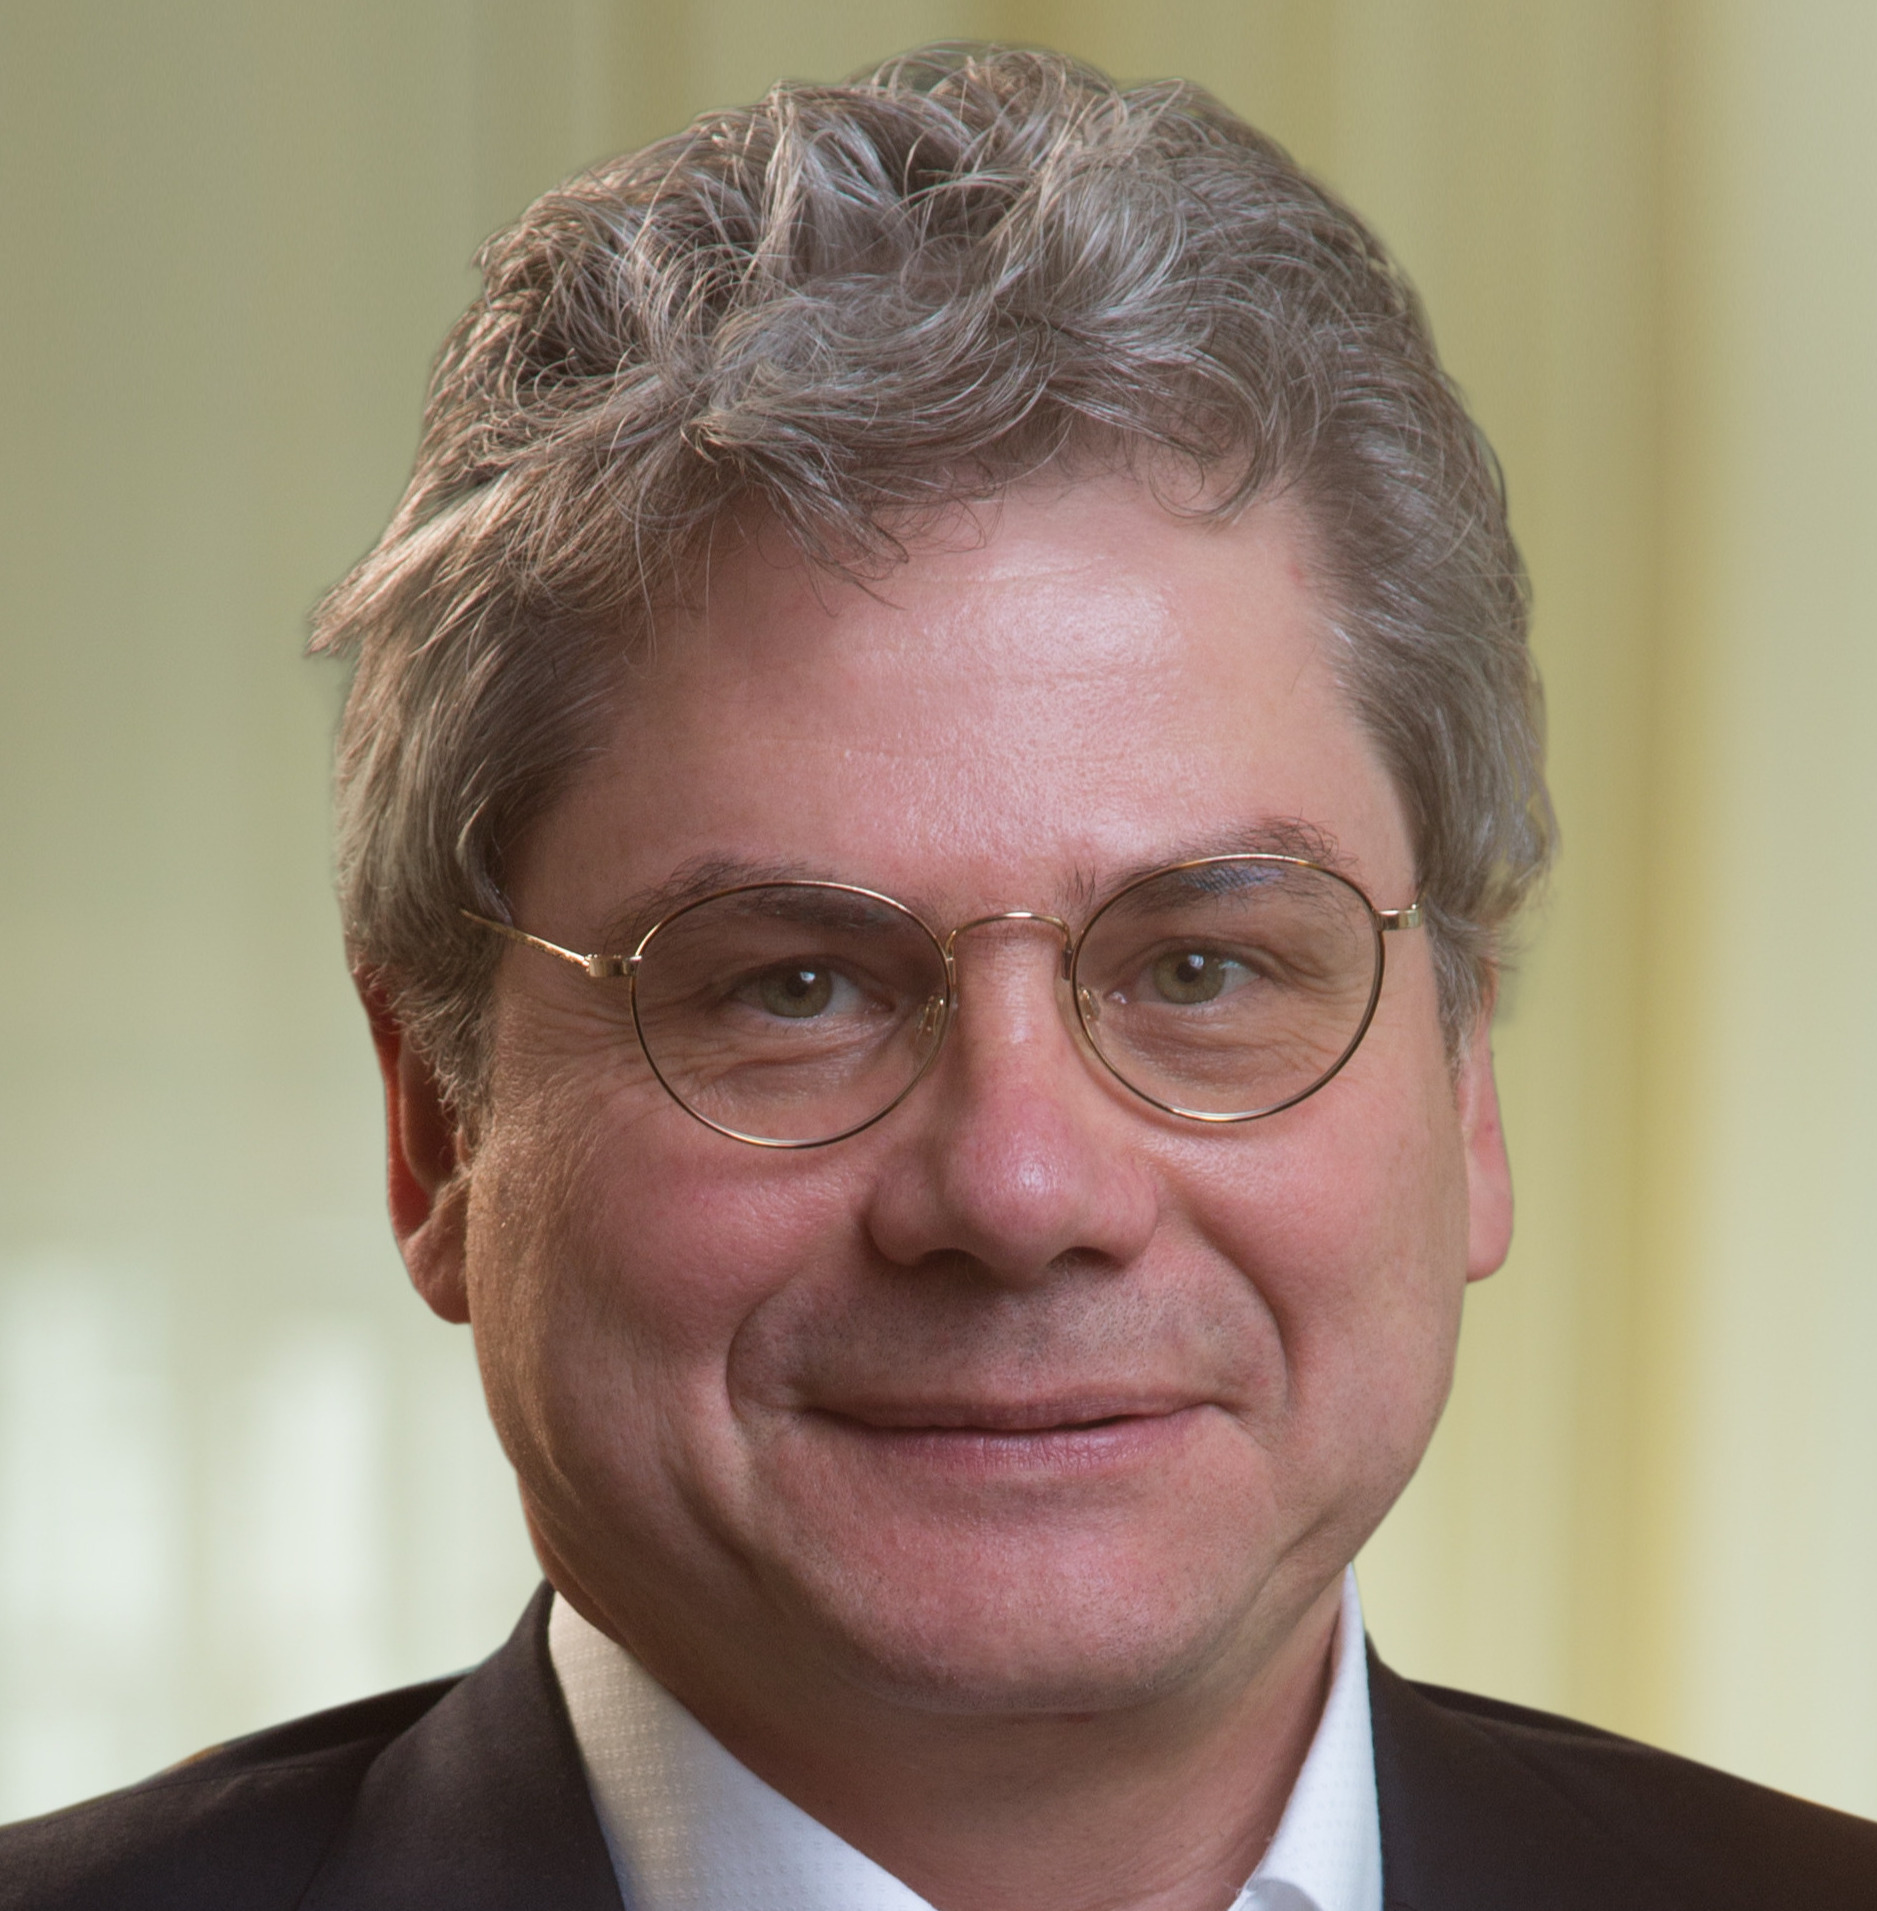 Thomas Hanselmann